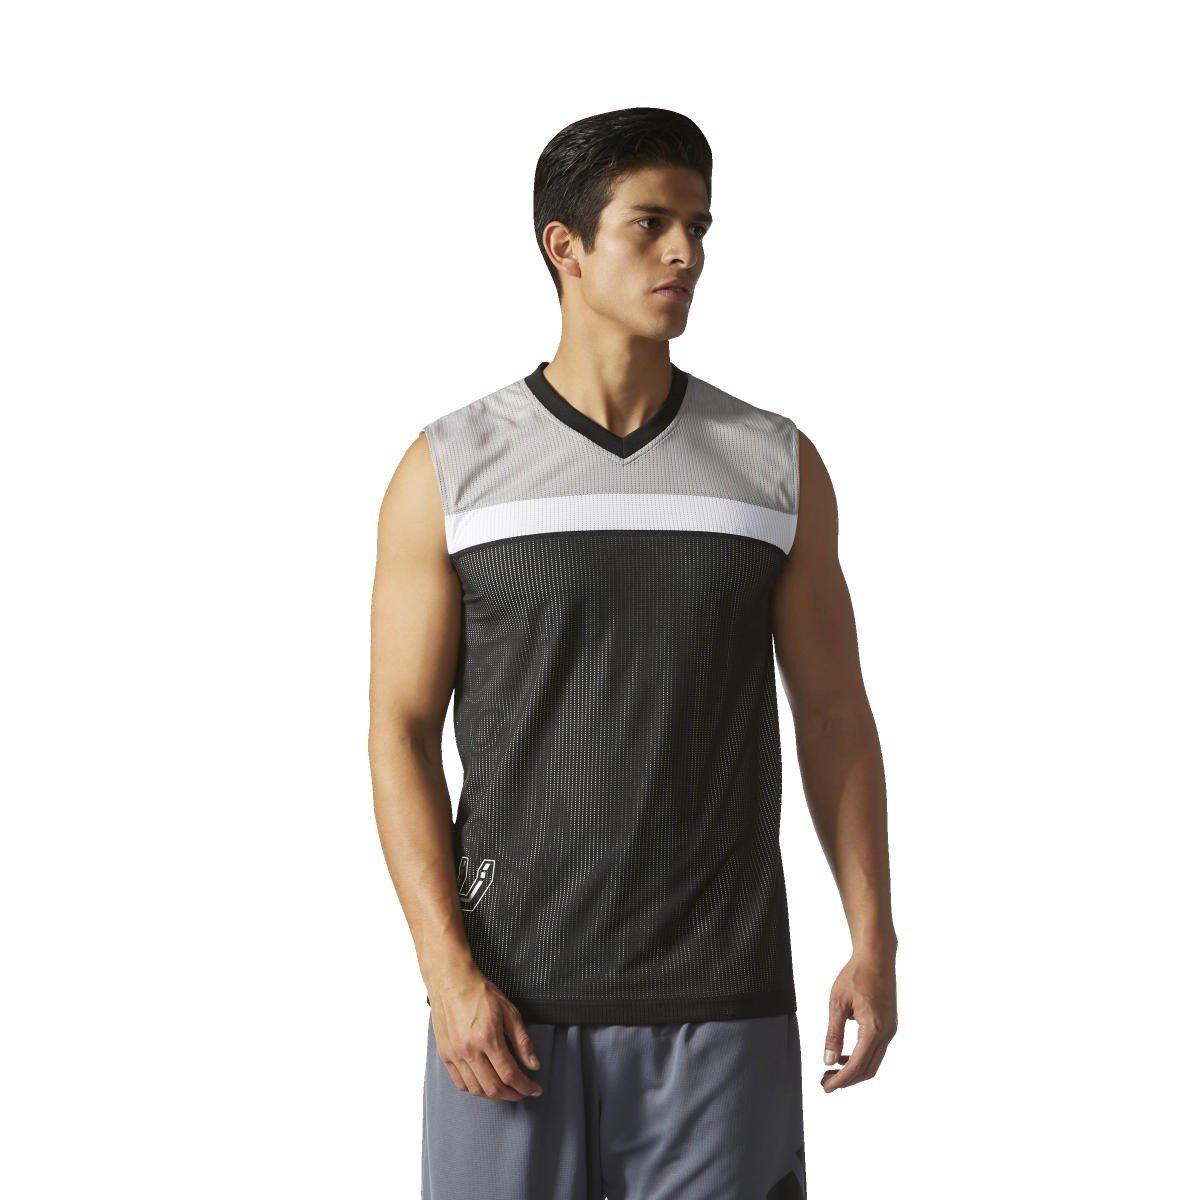 Adidas Smr RN Rev SL Maillot San Antonio Spurs de Basketball pour Homme, Multicouleure (Nbasas), XL